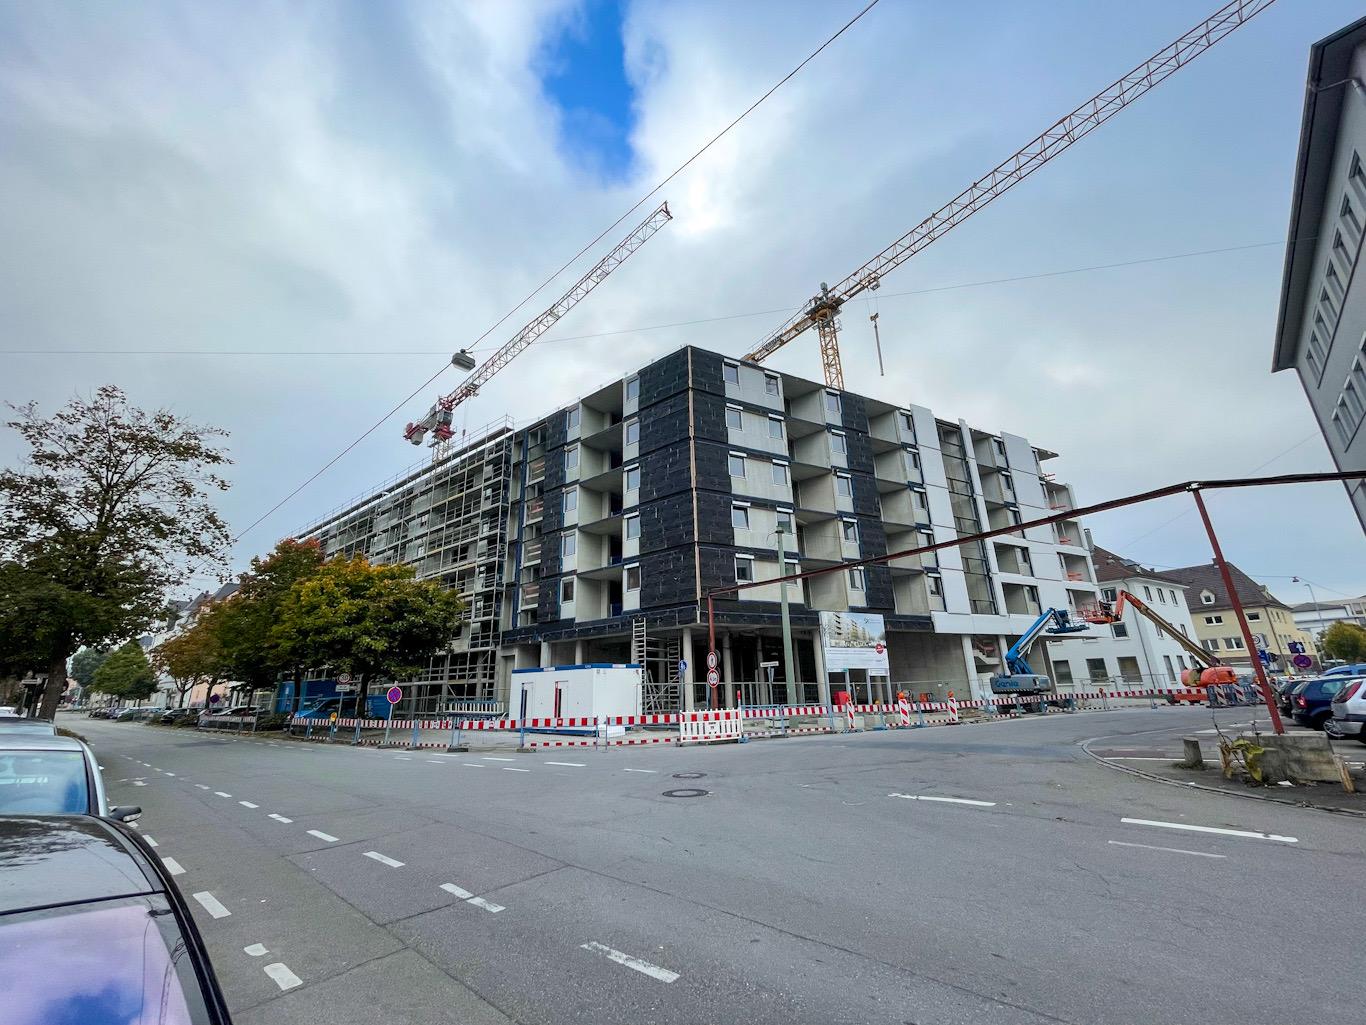 Ulm, Neubau, Oktober 2021